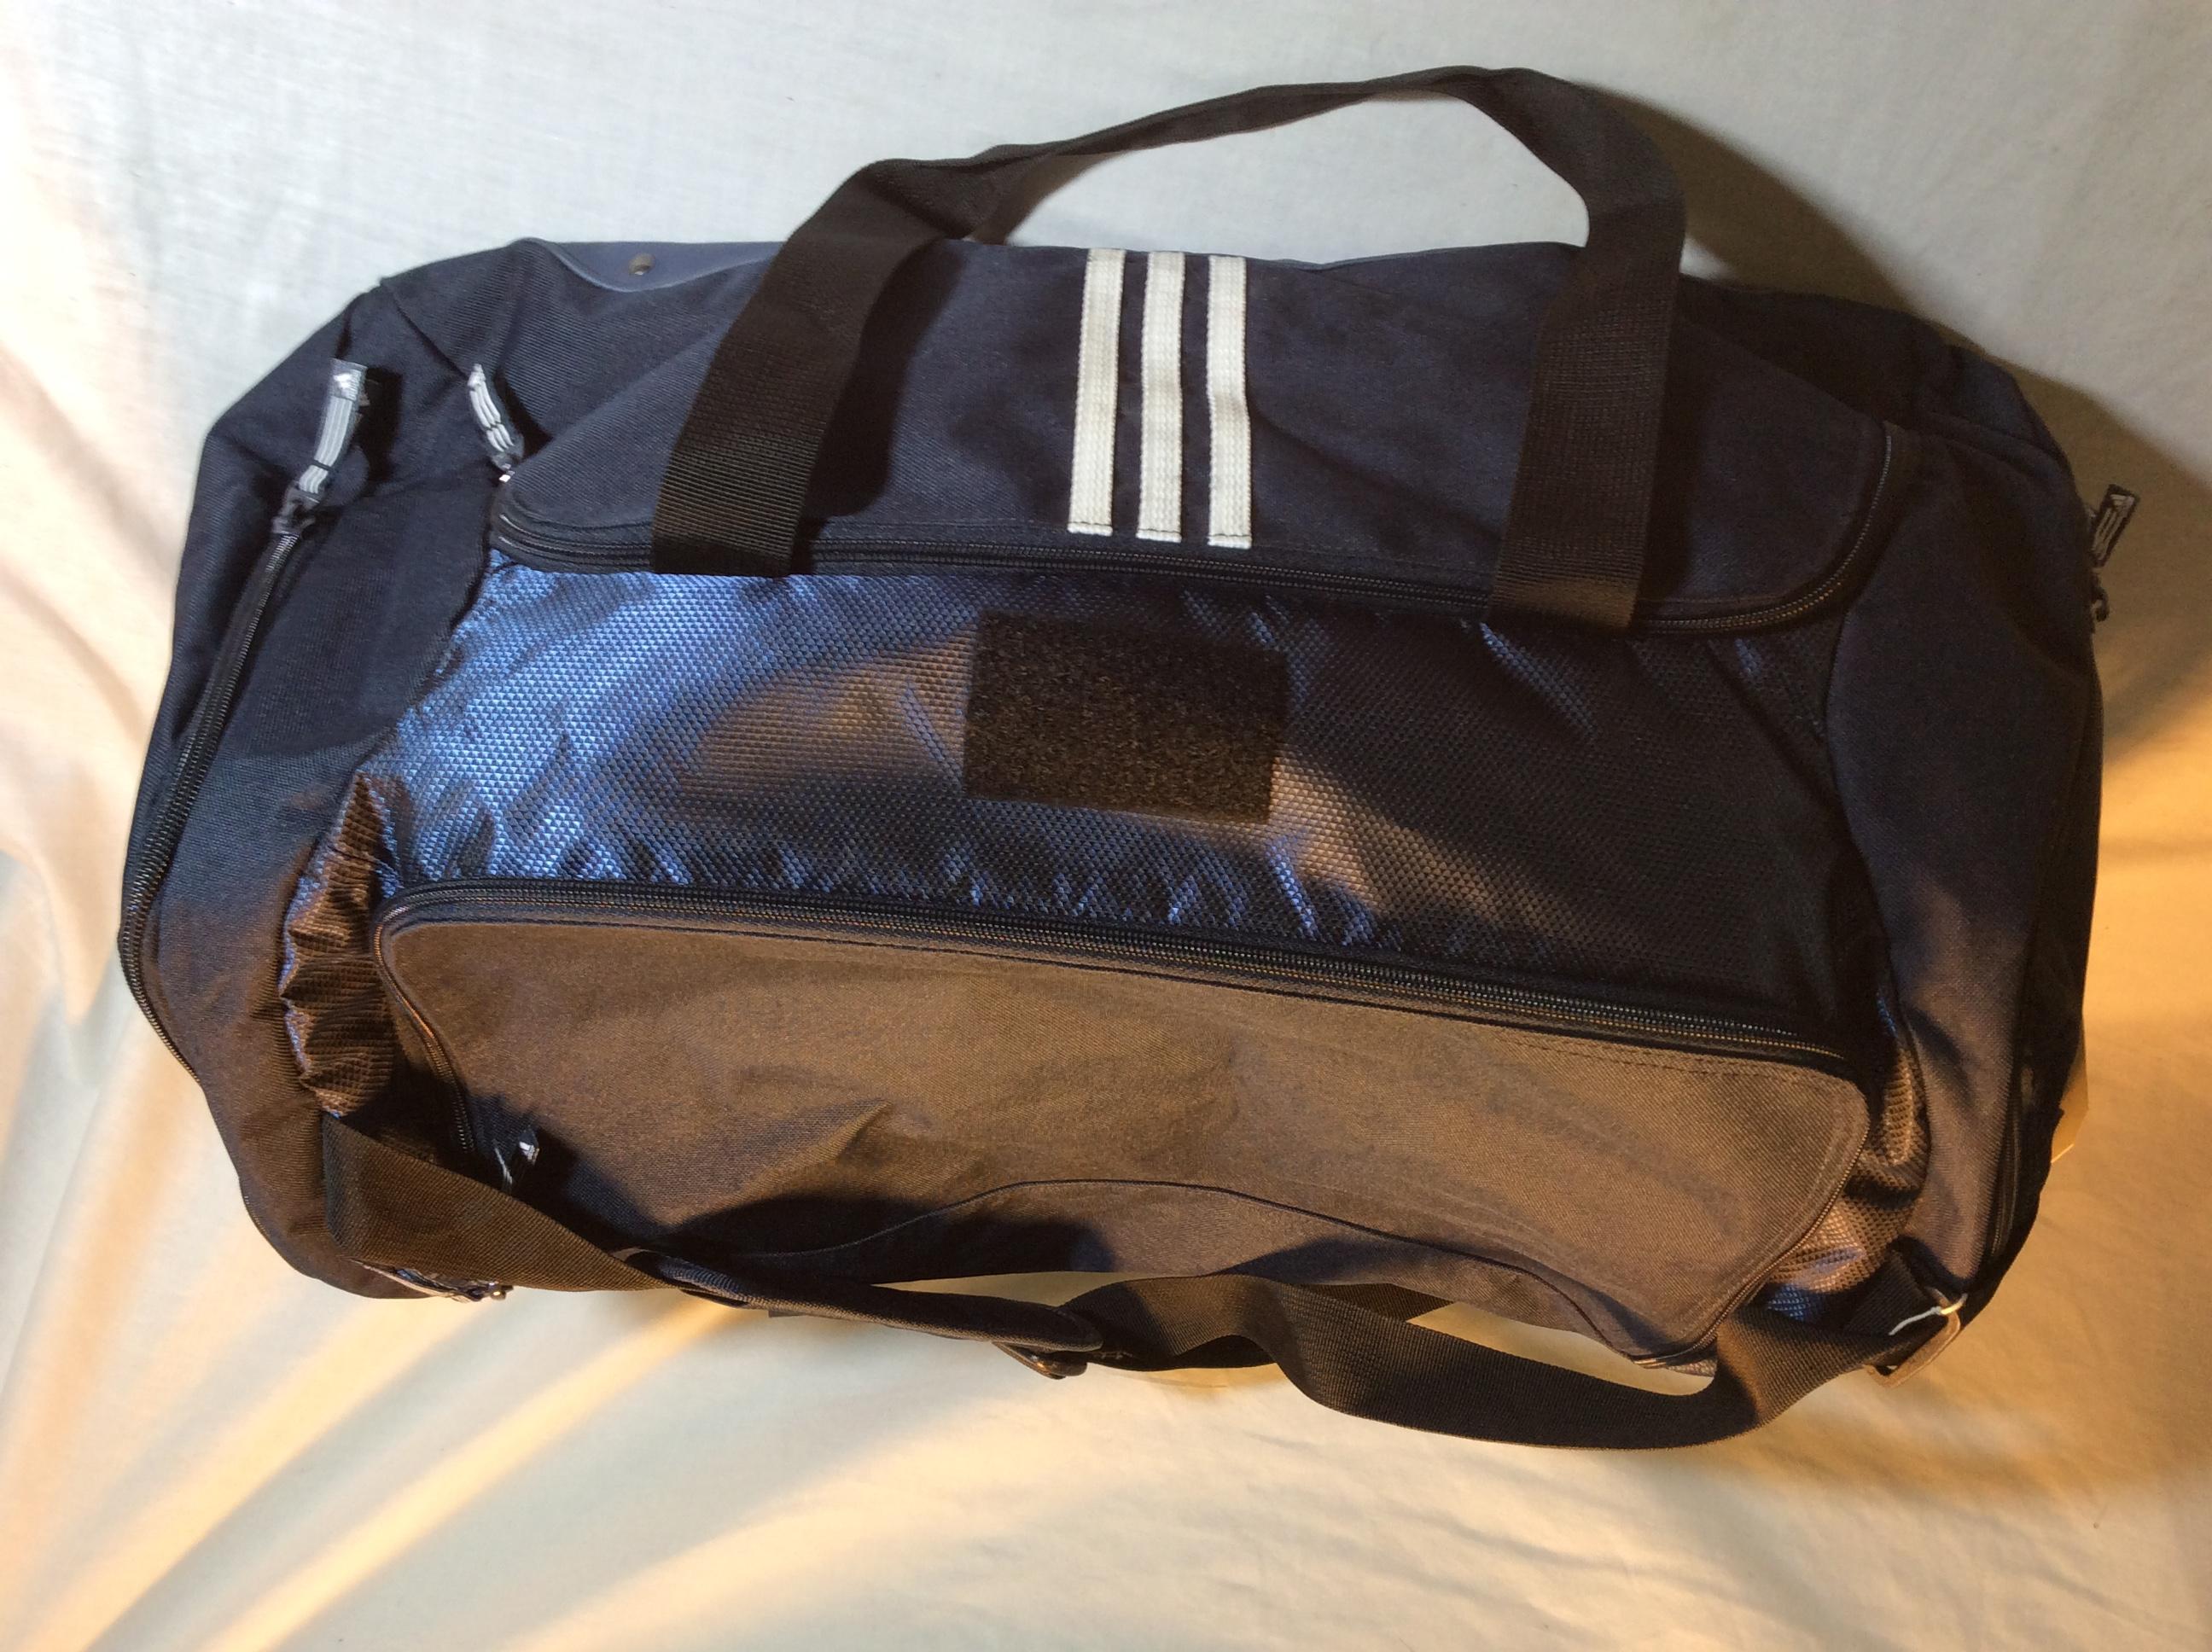 Blue Adidas duffle bag